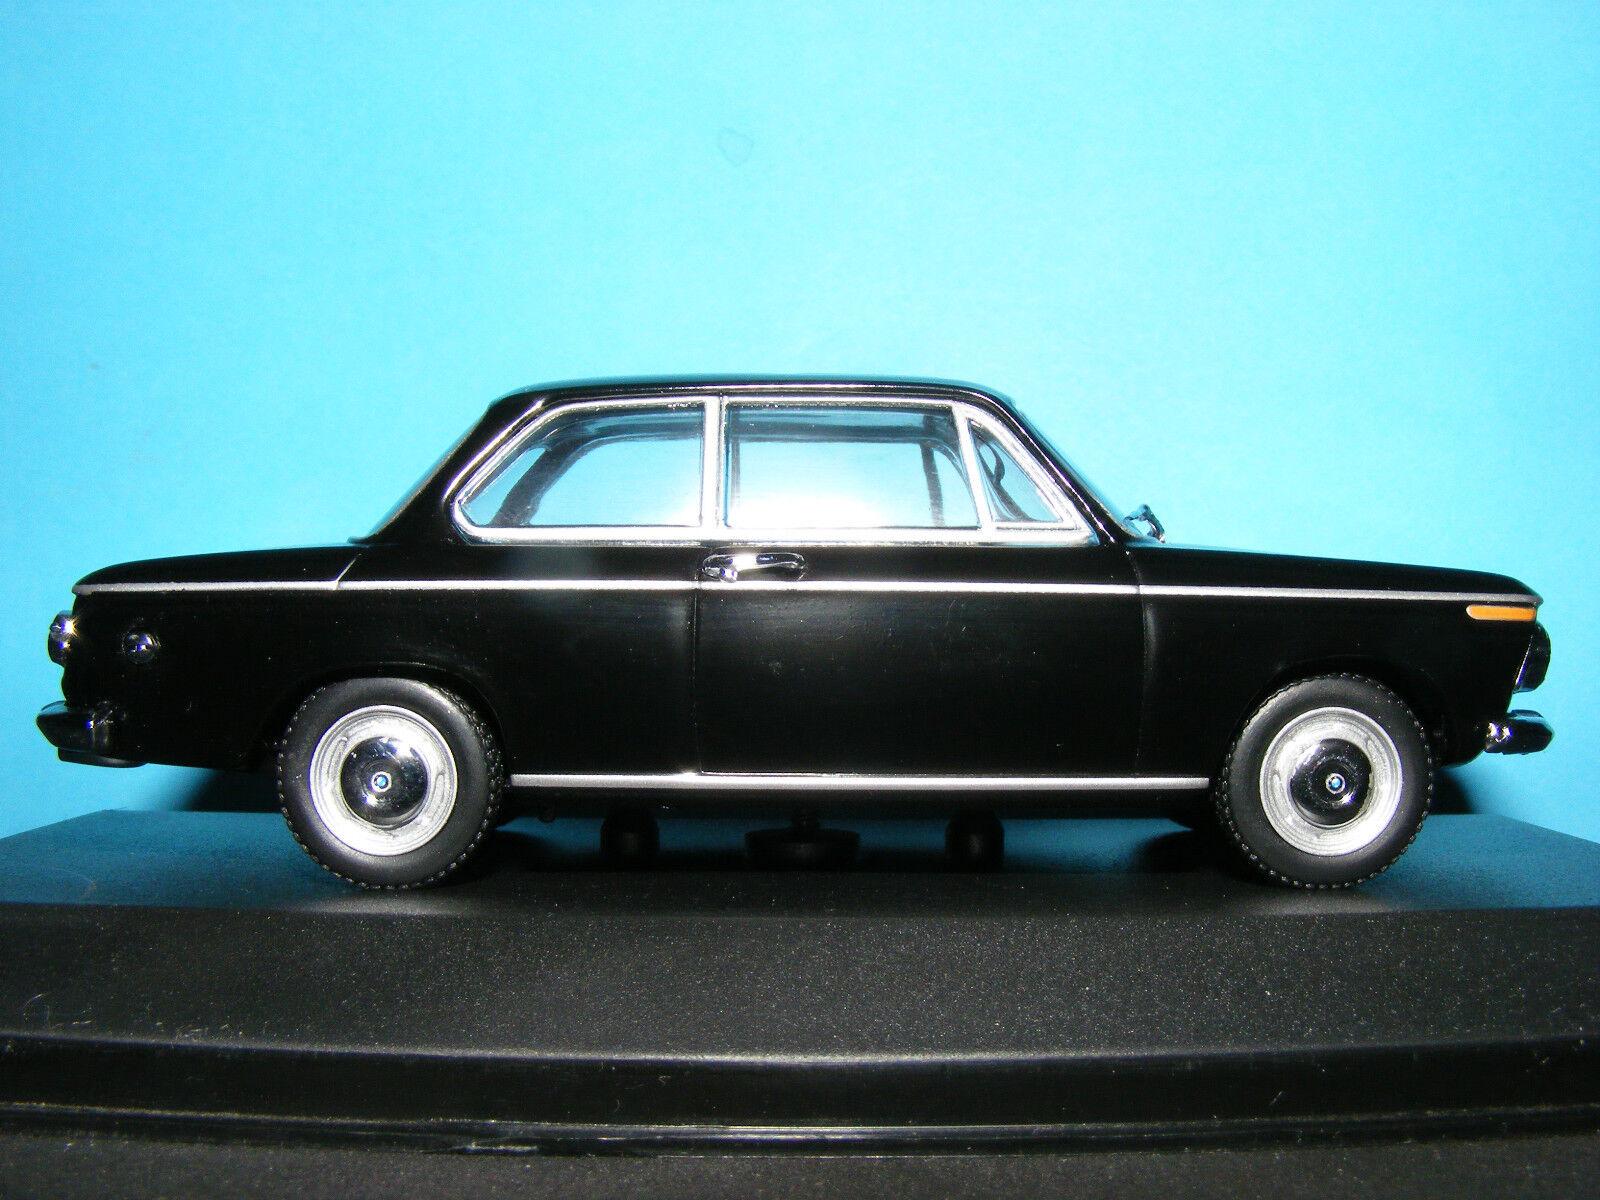 BMW 1600 in (environ 4064.00 cm) Noir Avec Noir Tex de 1966 1 43RD. Minichamp. Ver Rare